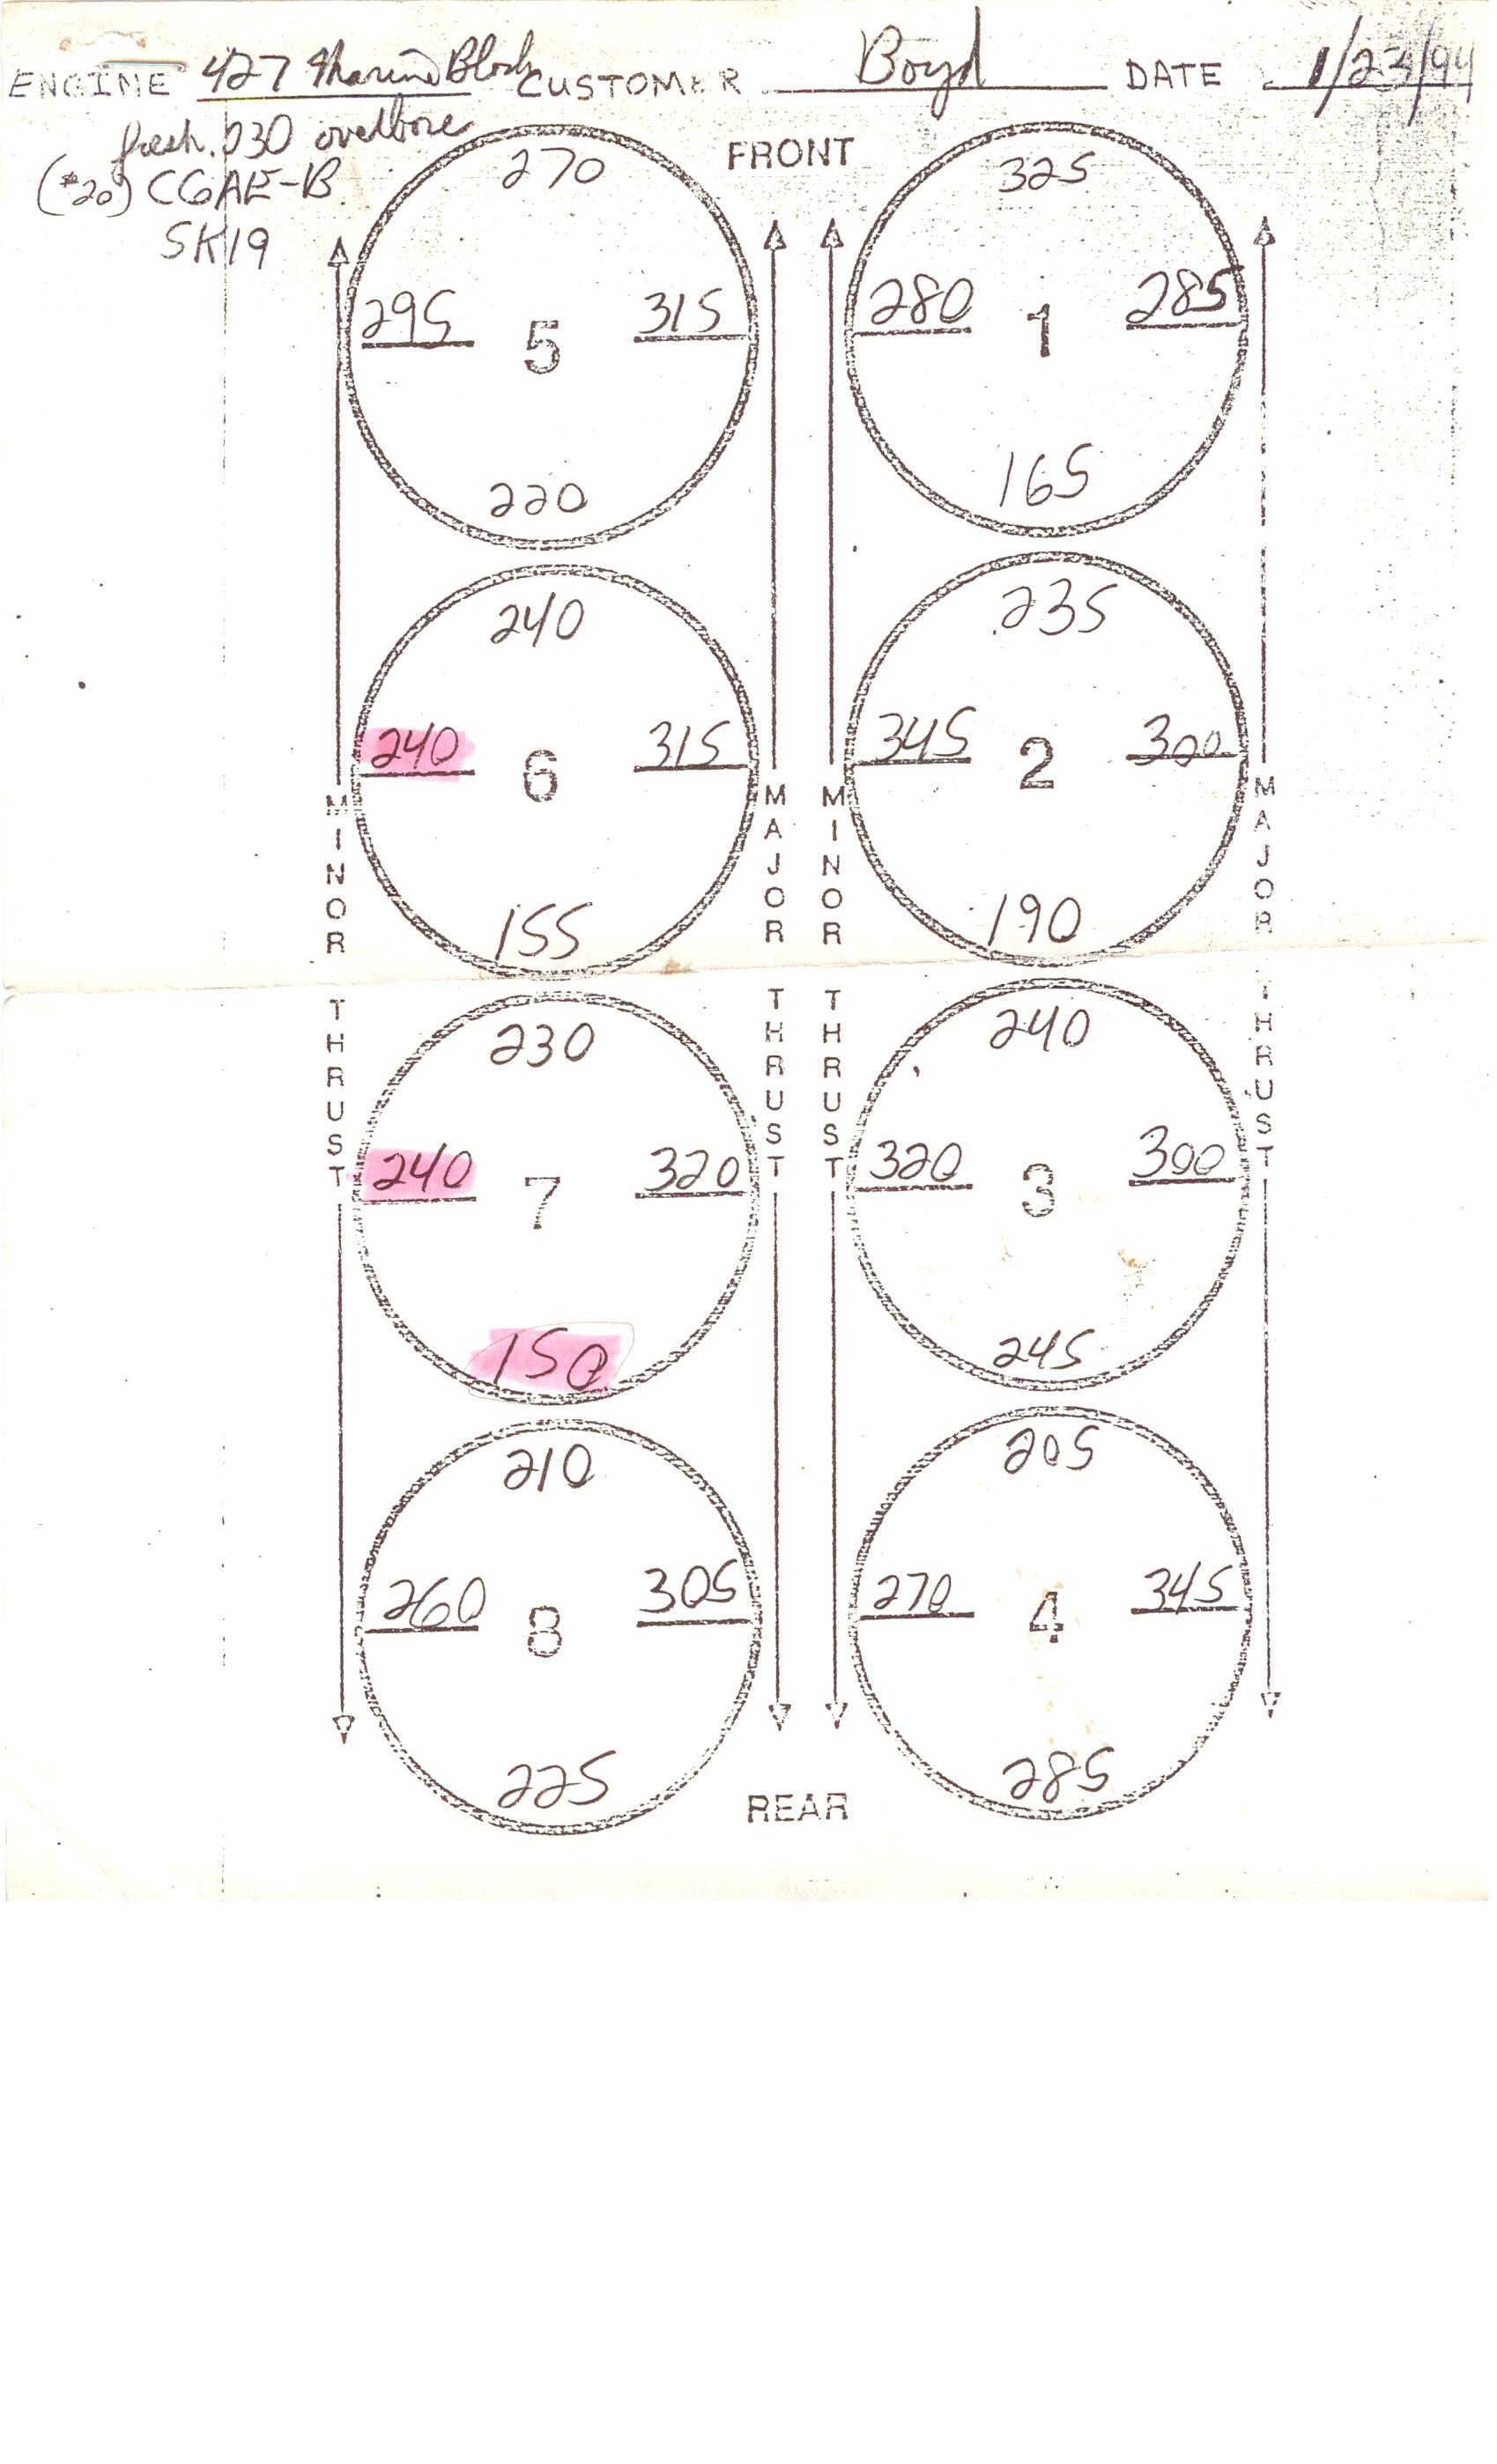 332 428 ford fe engine forum sonic data sheet